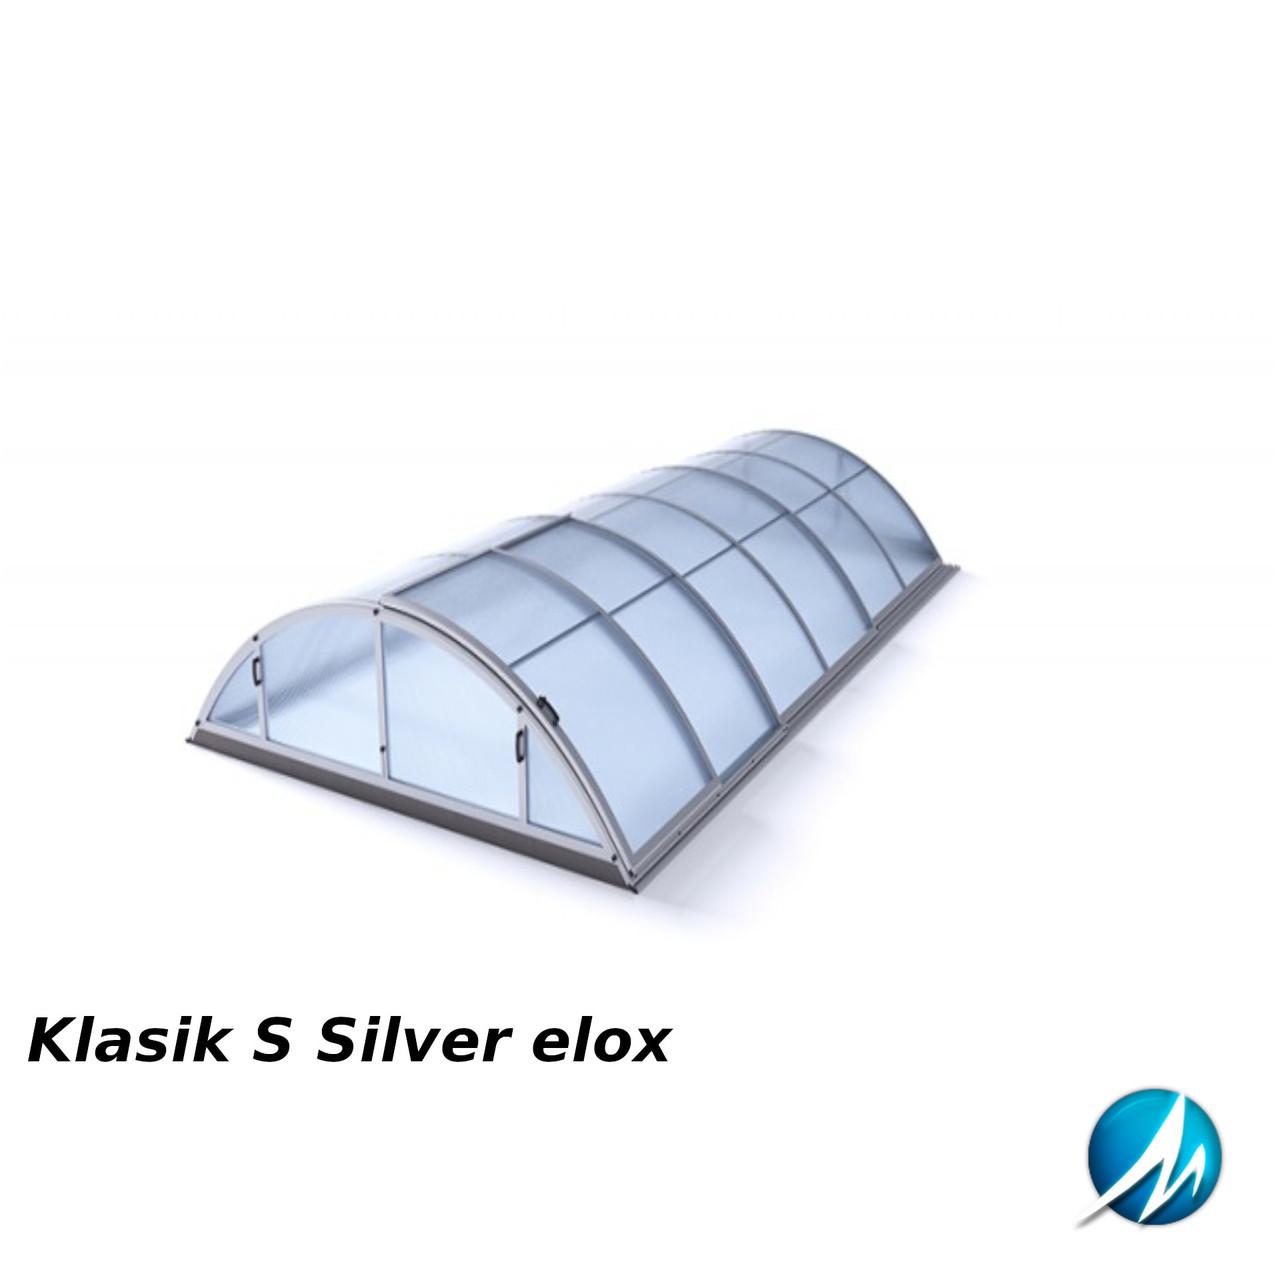 Павильон для бассейна Klasik S 3,6х4,3х1м - Silver elox